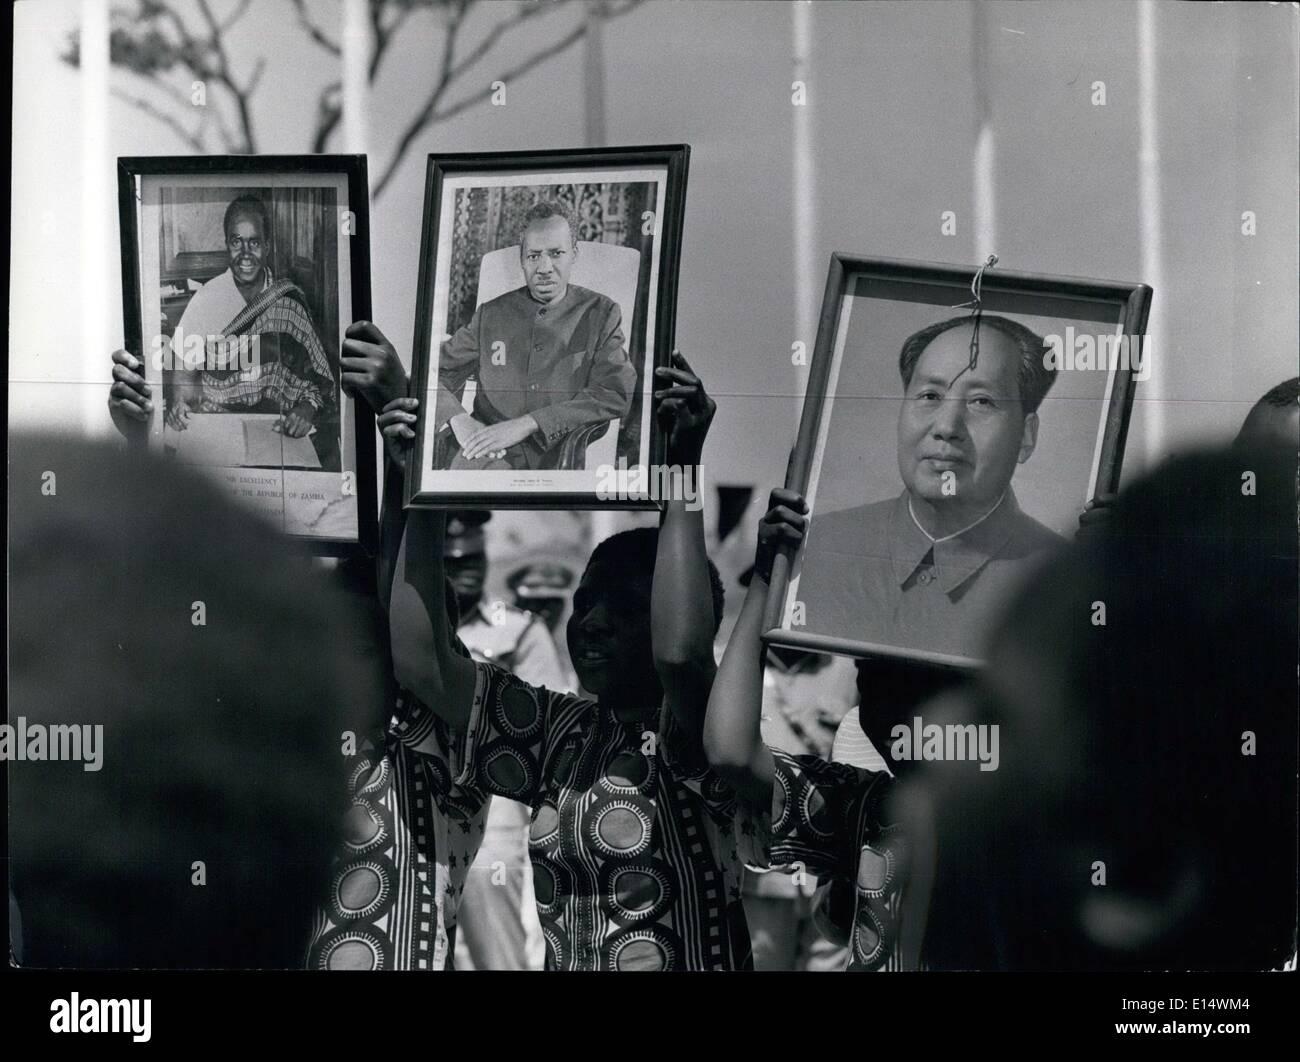 Apr. 18, 2012 - Dancing children hold aloft portraits of Chairman Mac Tsu-tund together with those of Presidents Nyerere and Kauna. Border crossing emergency for UHURU railroad at Zanbia-Tanzania border. - Stock Image